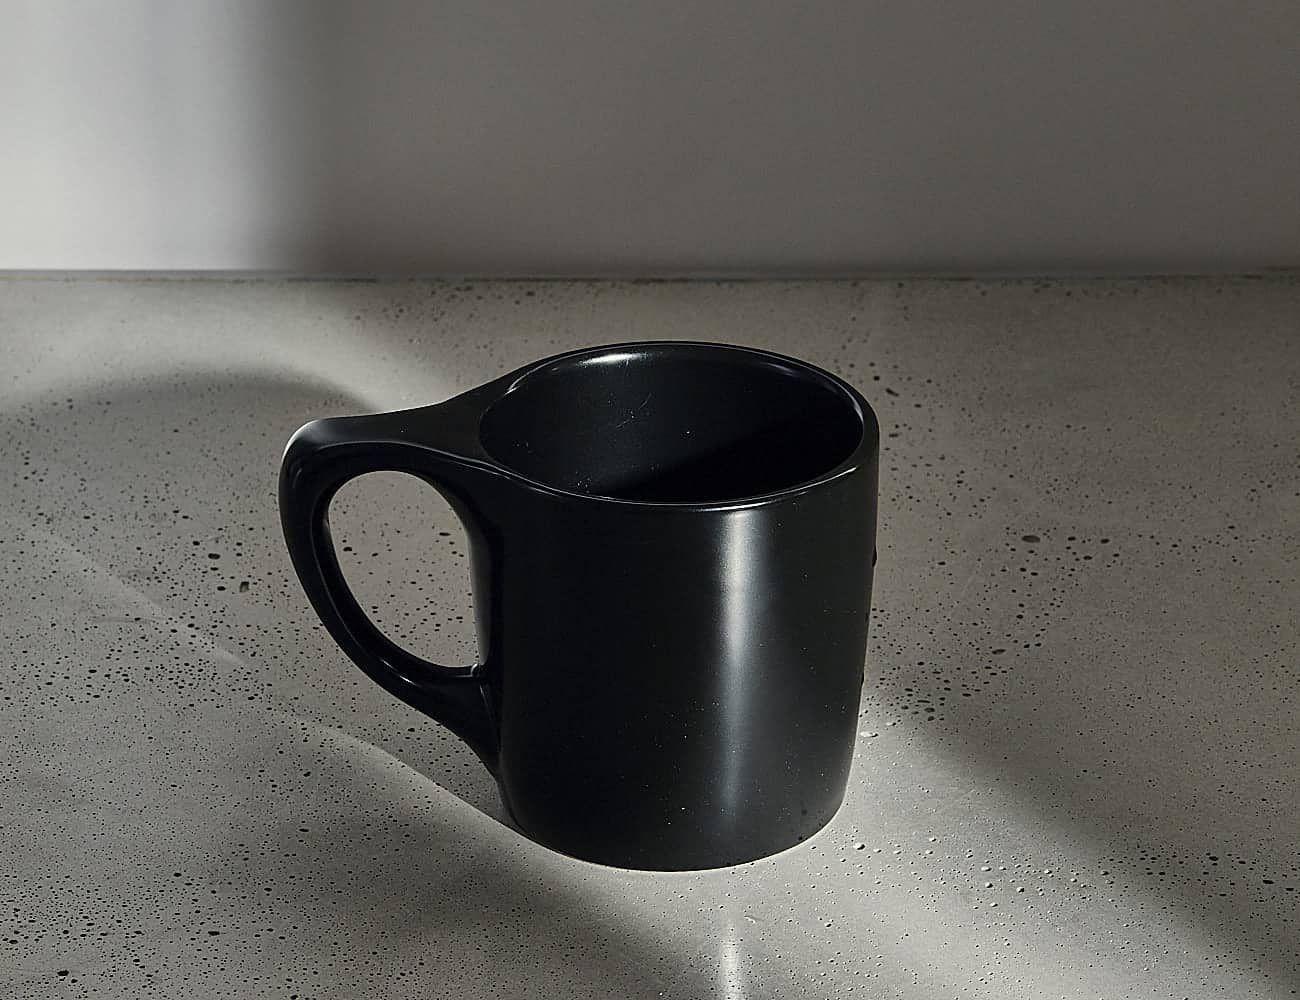 The Mug Coffee >> The 6 Best Coffee Mugs Of 2019 Gear Patrol